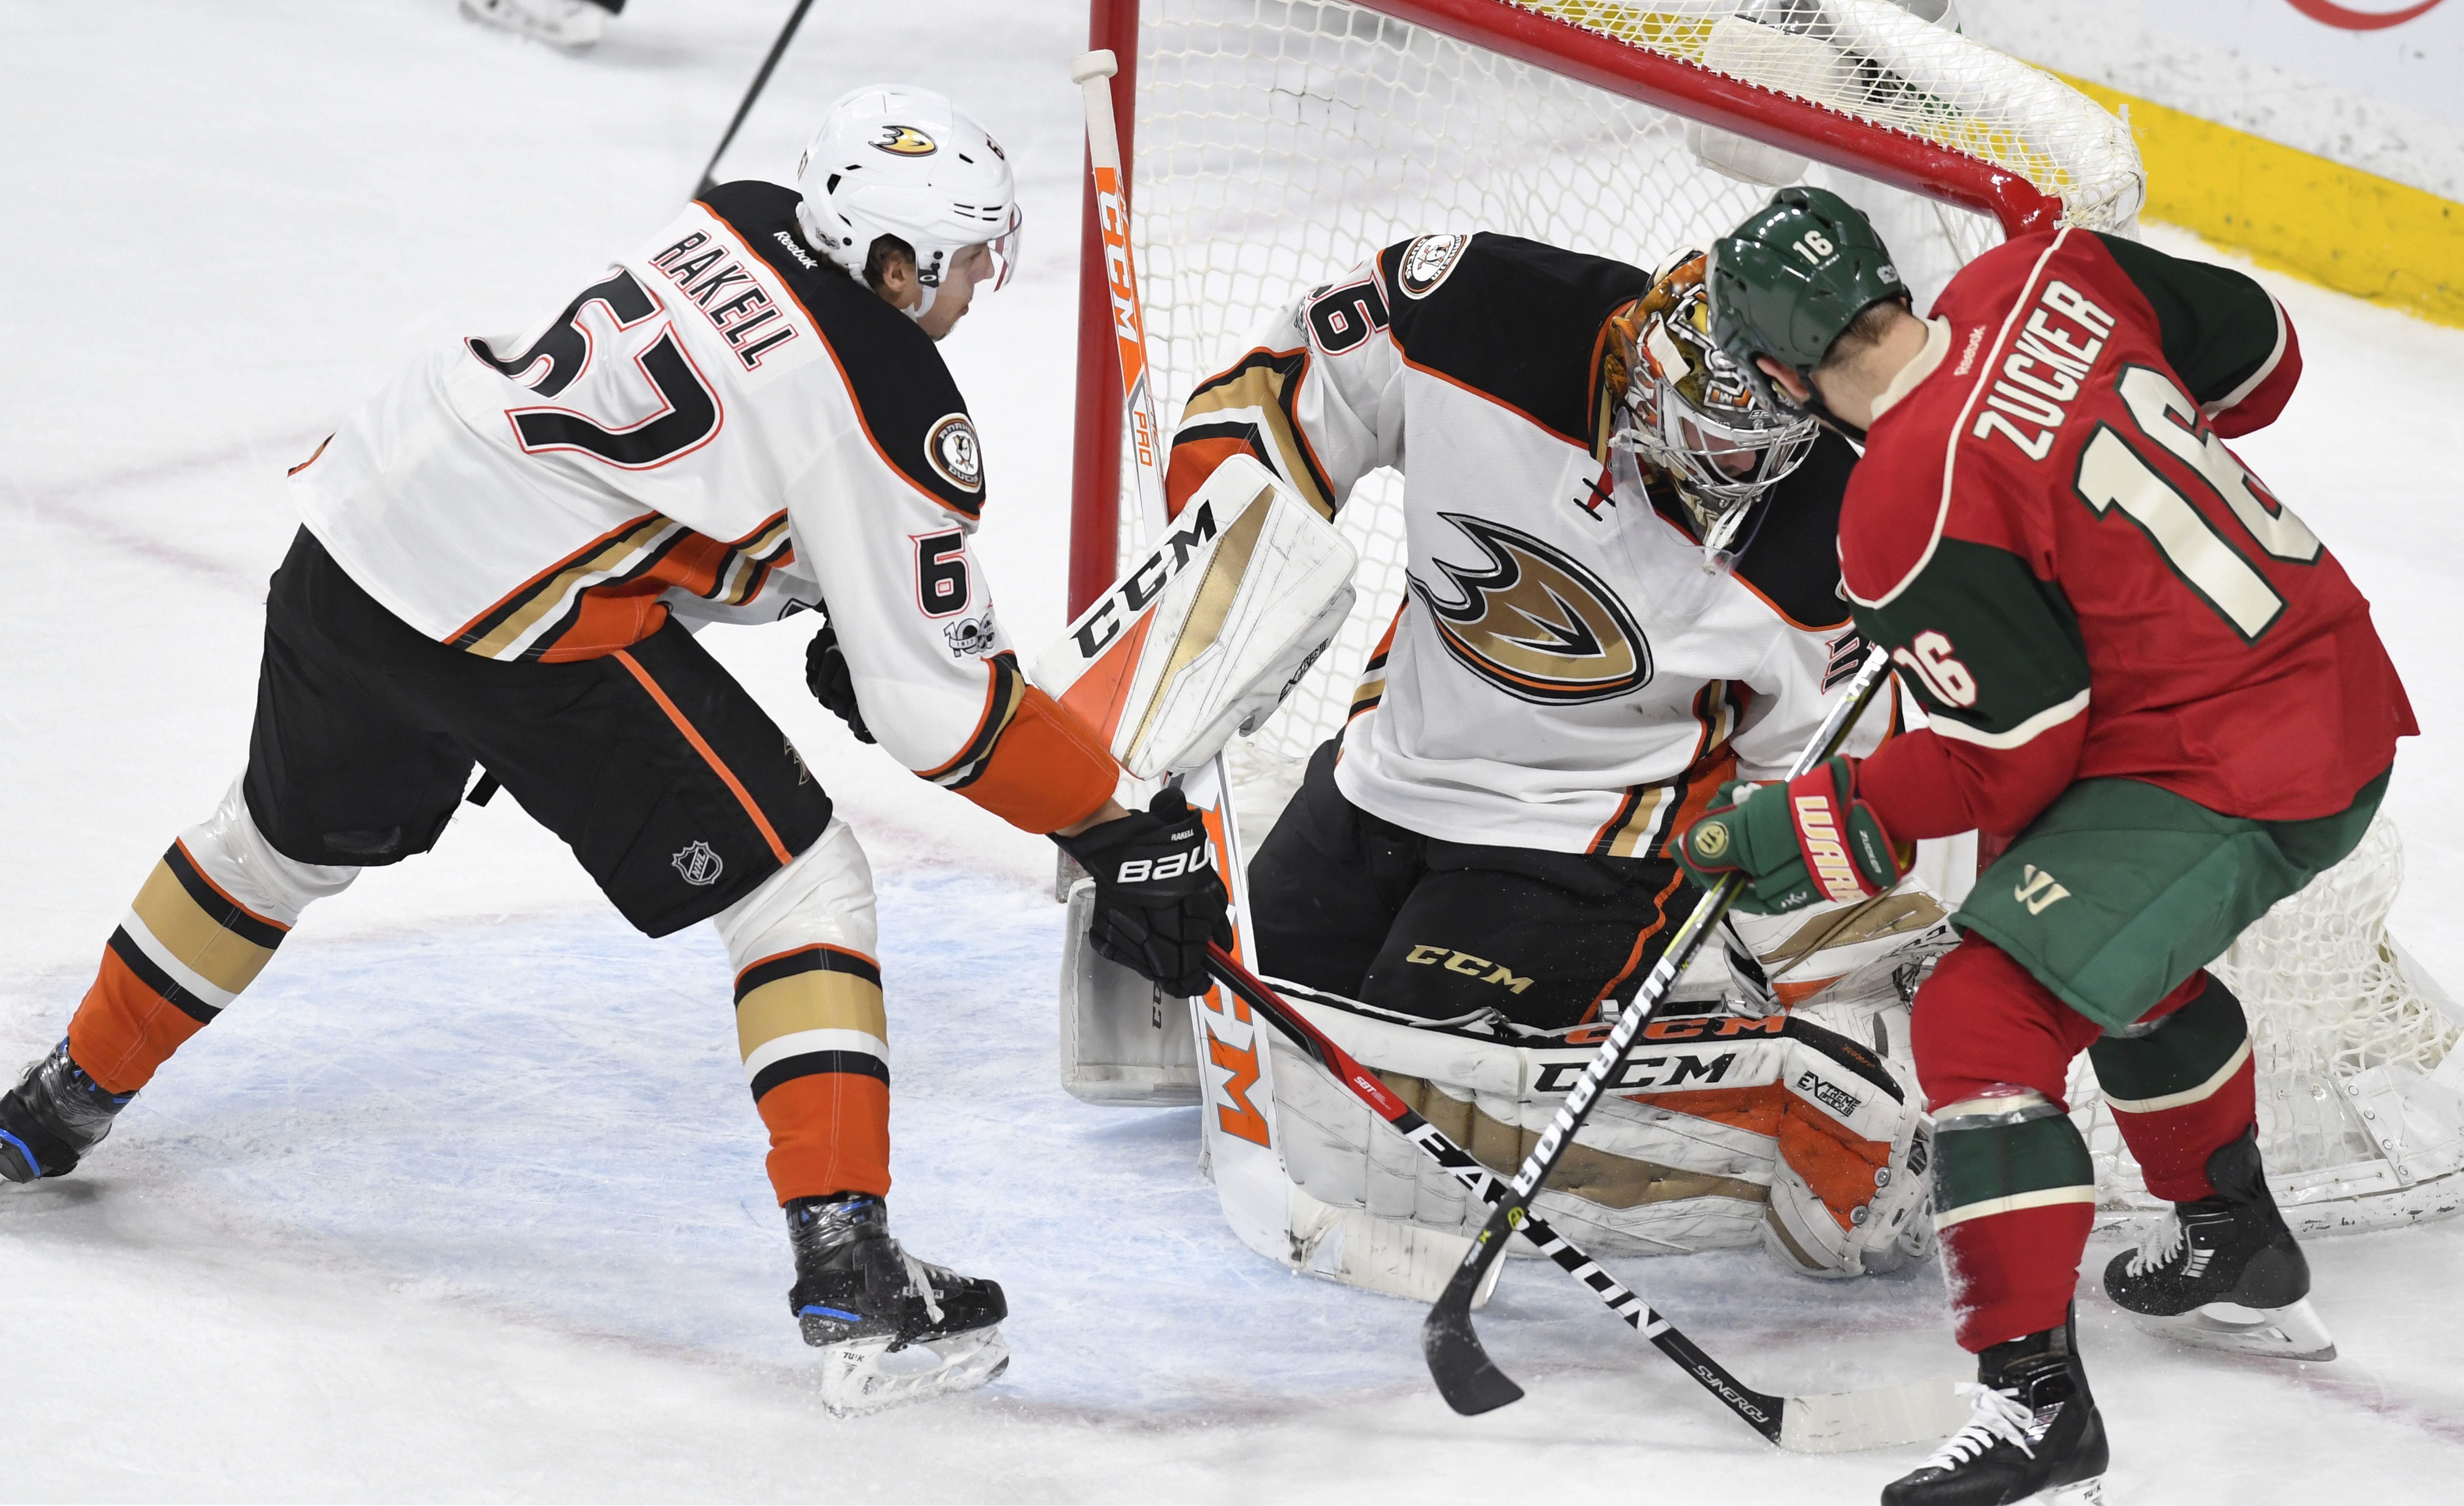 Ducks_wild_hockey_22863